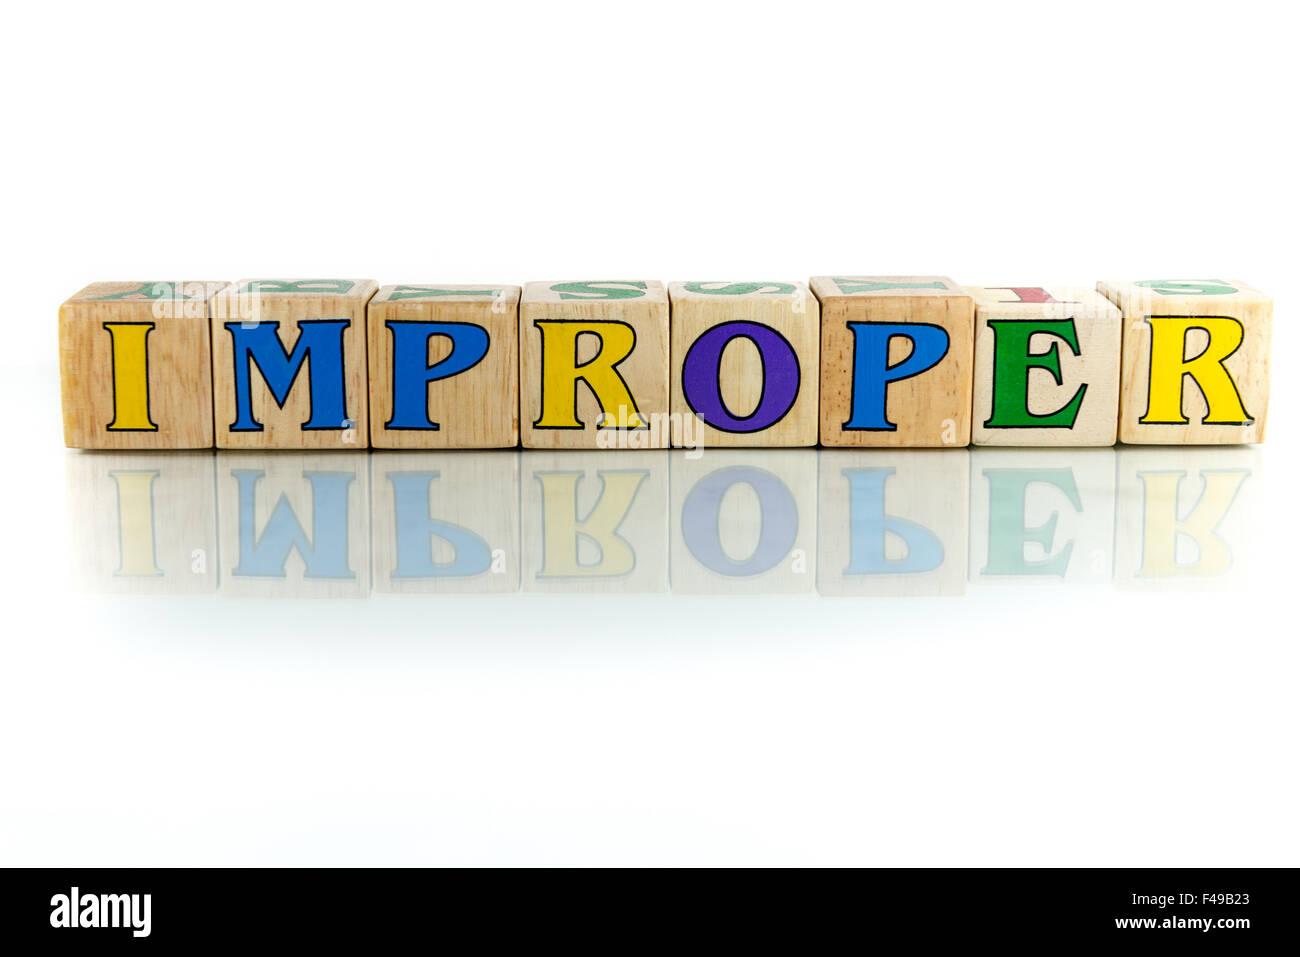 improper - Stock Image